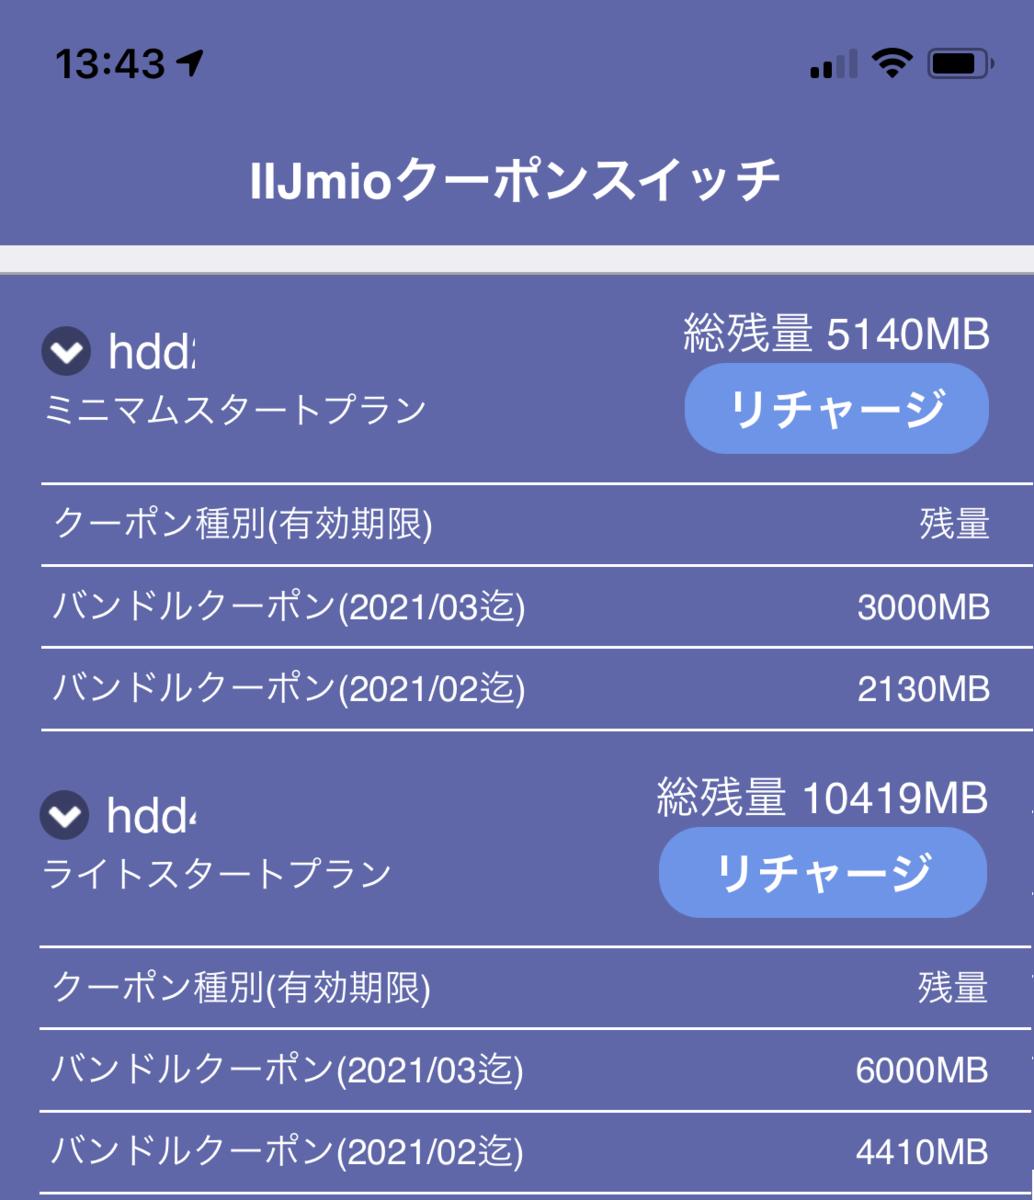 f:id:KuriKumaChan:20210225134743p:plain